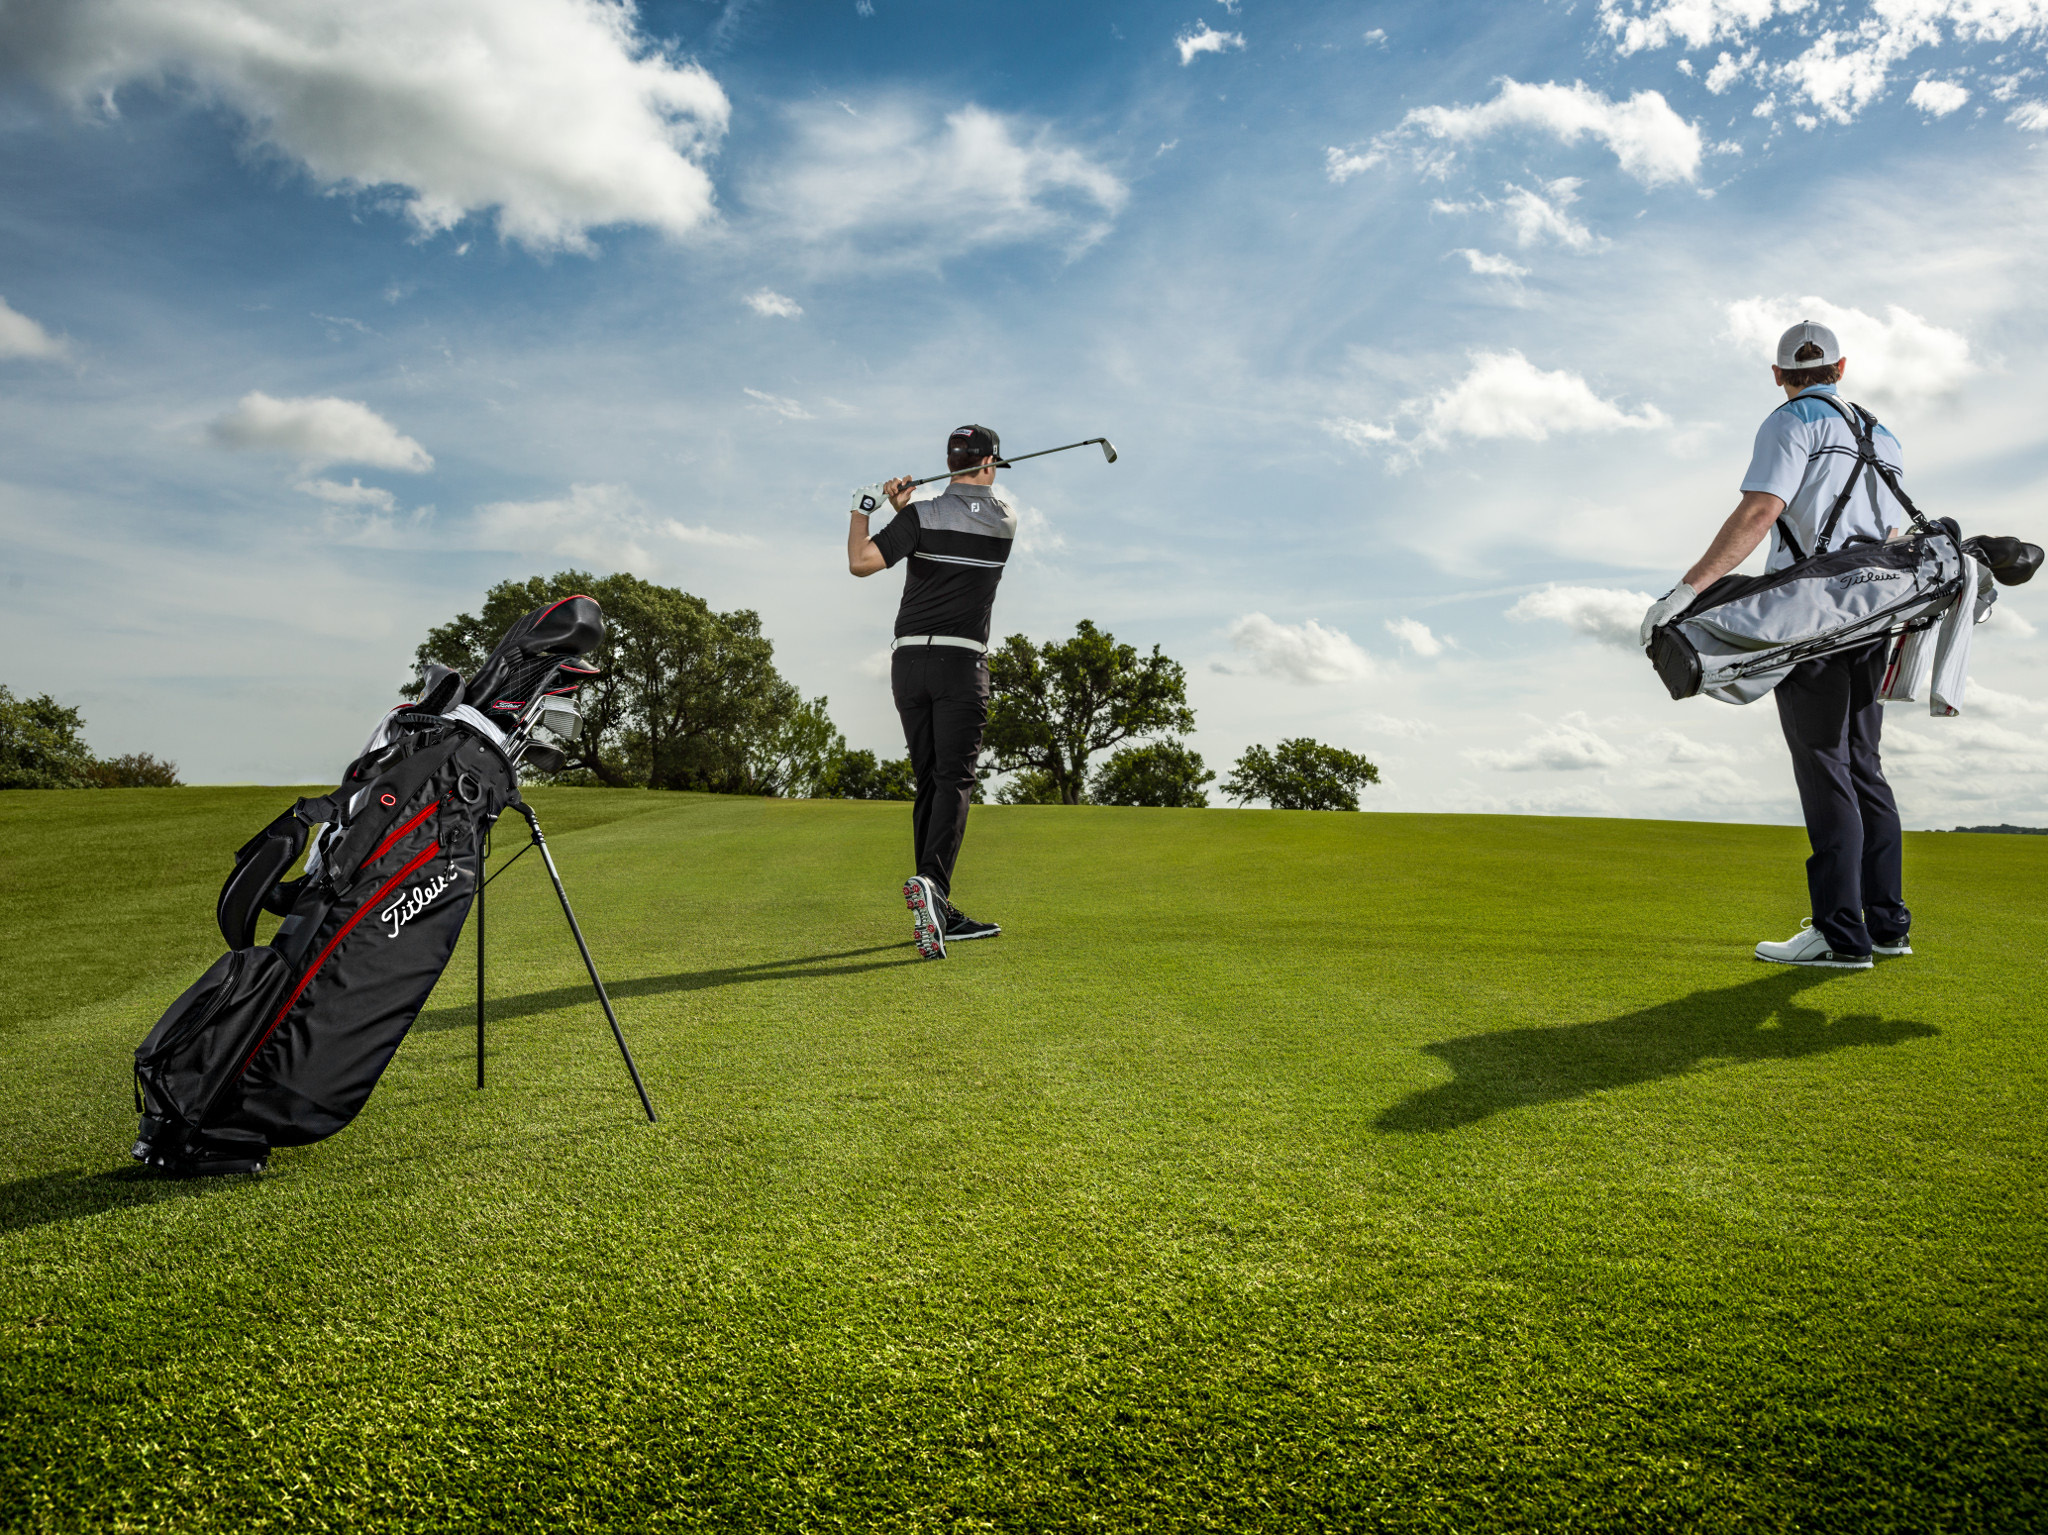 © Golfsupport.co.uk